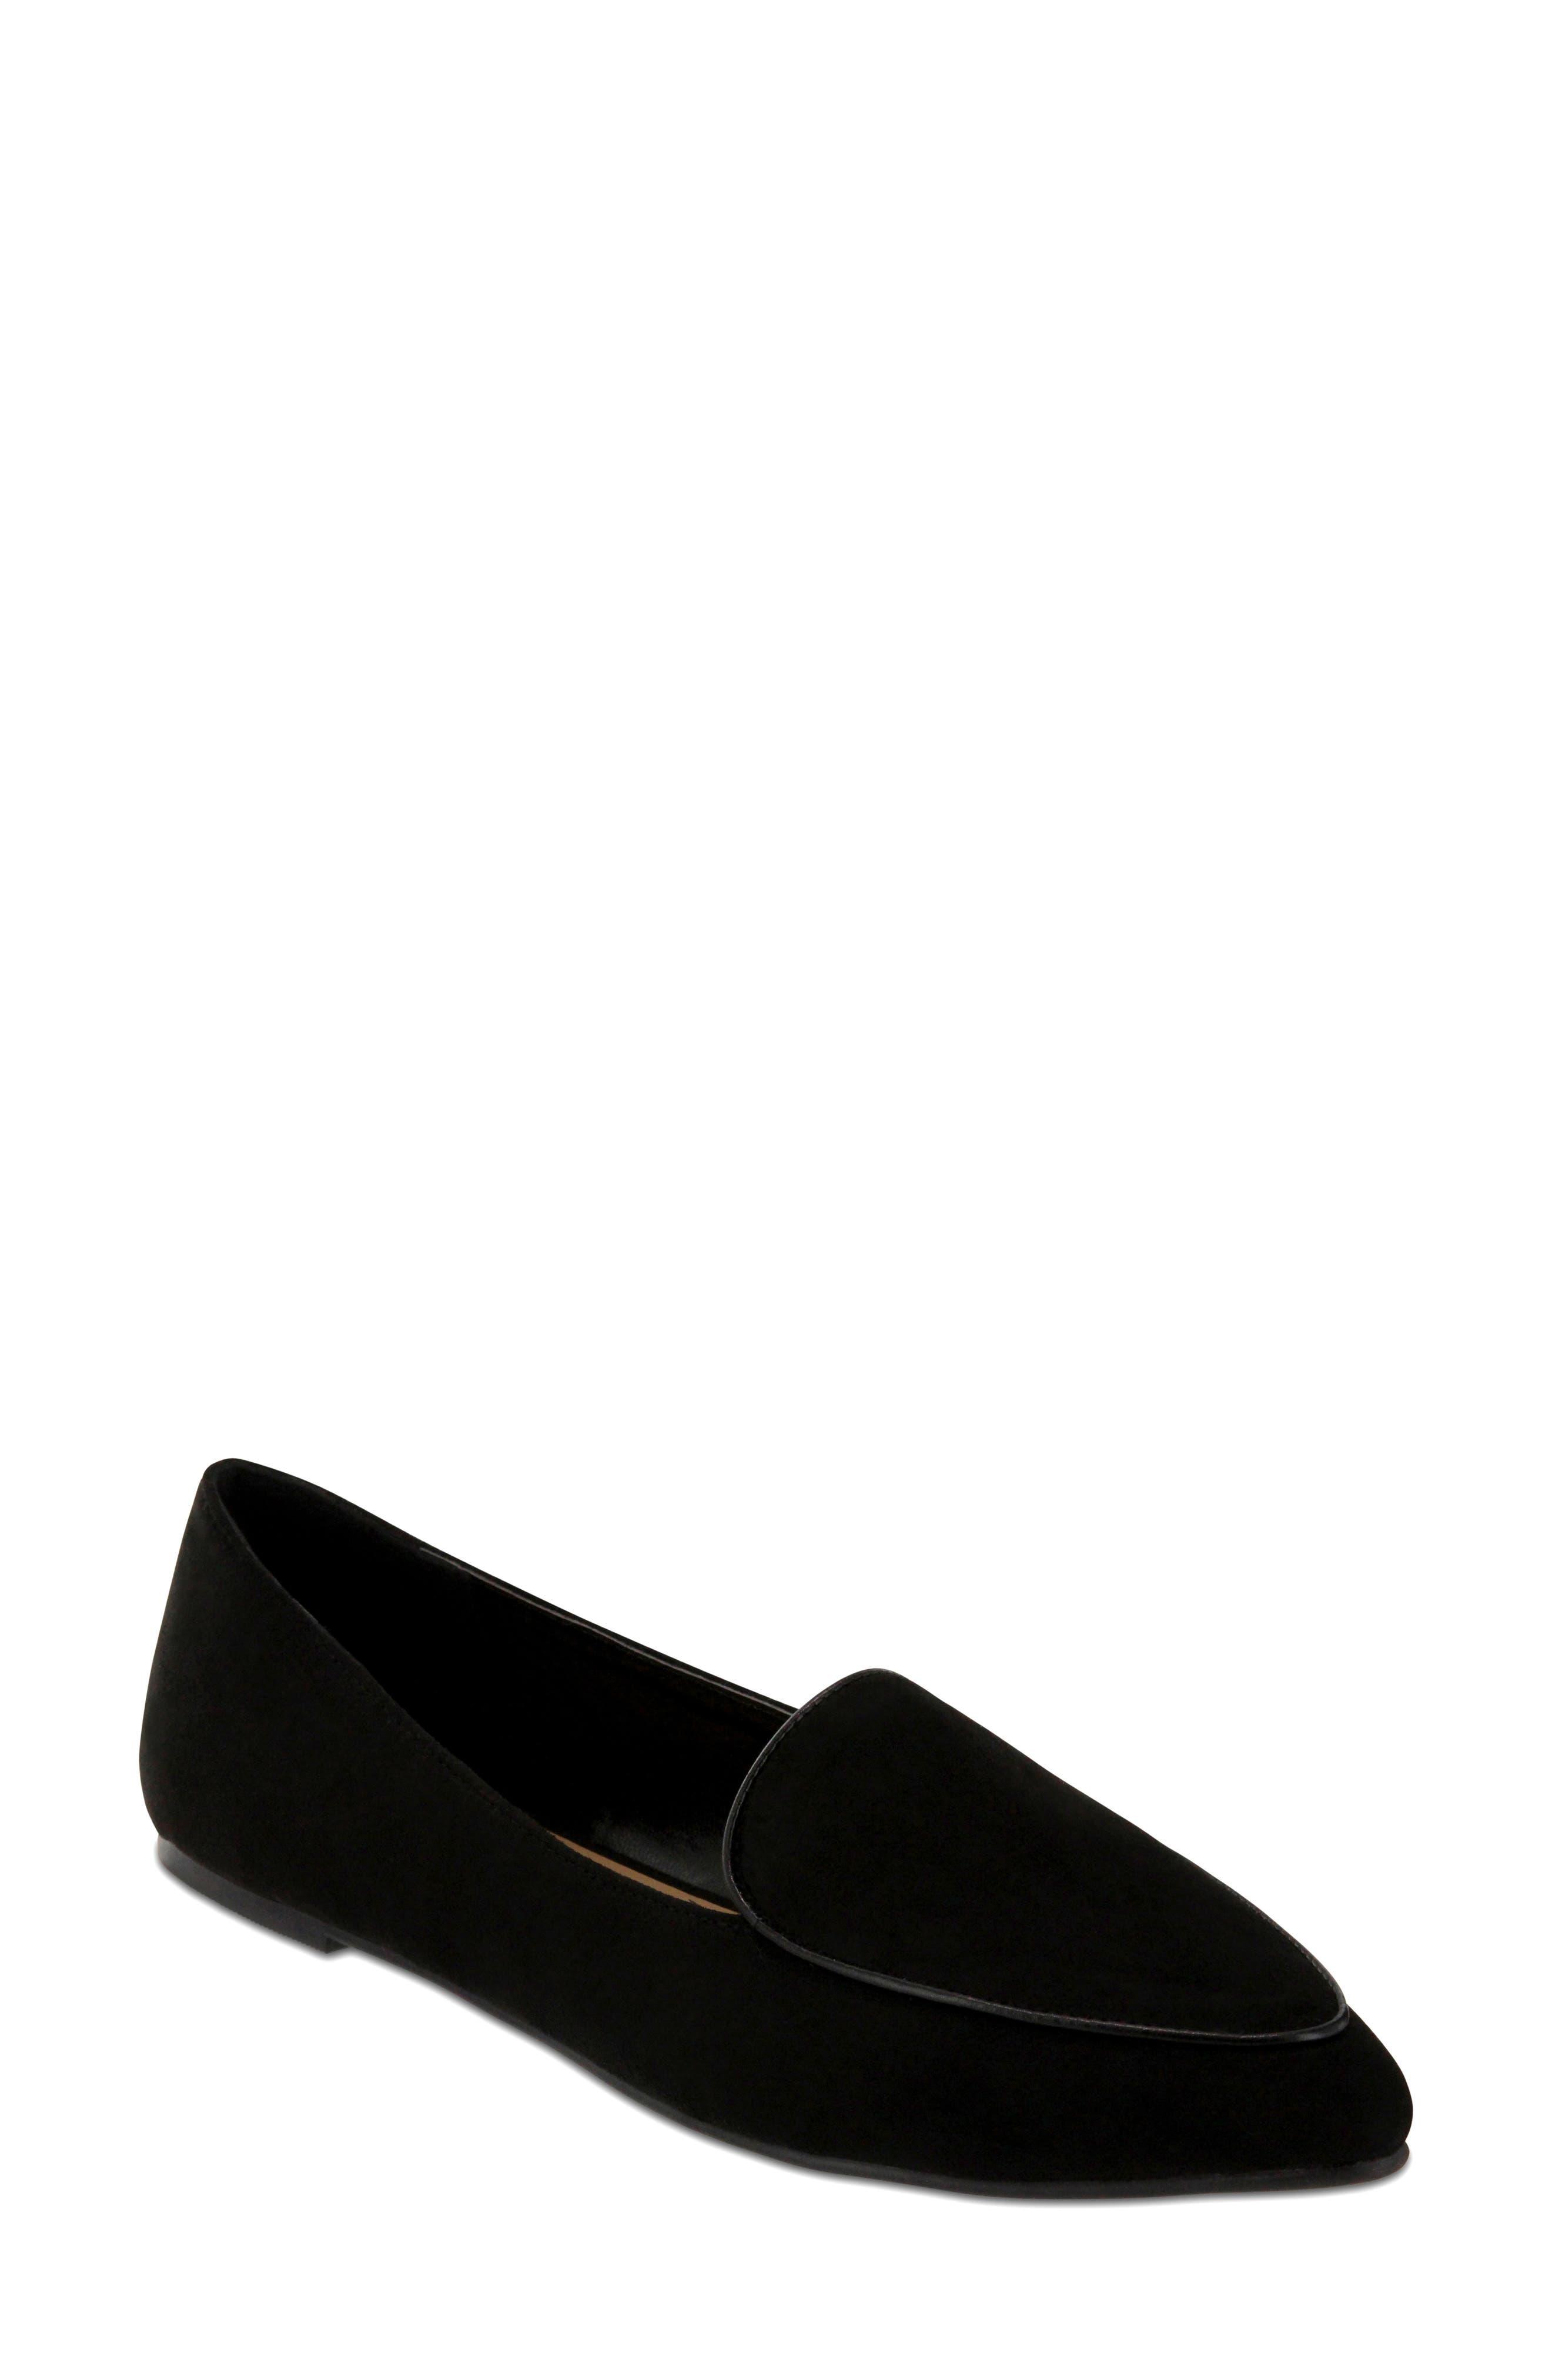 Niles Loafer,                             Main thumbnail 1, color,                             Black